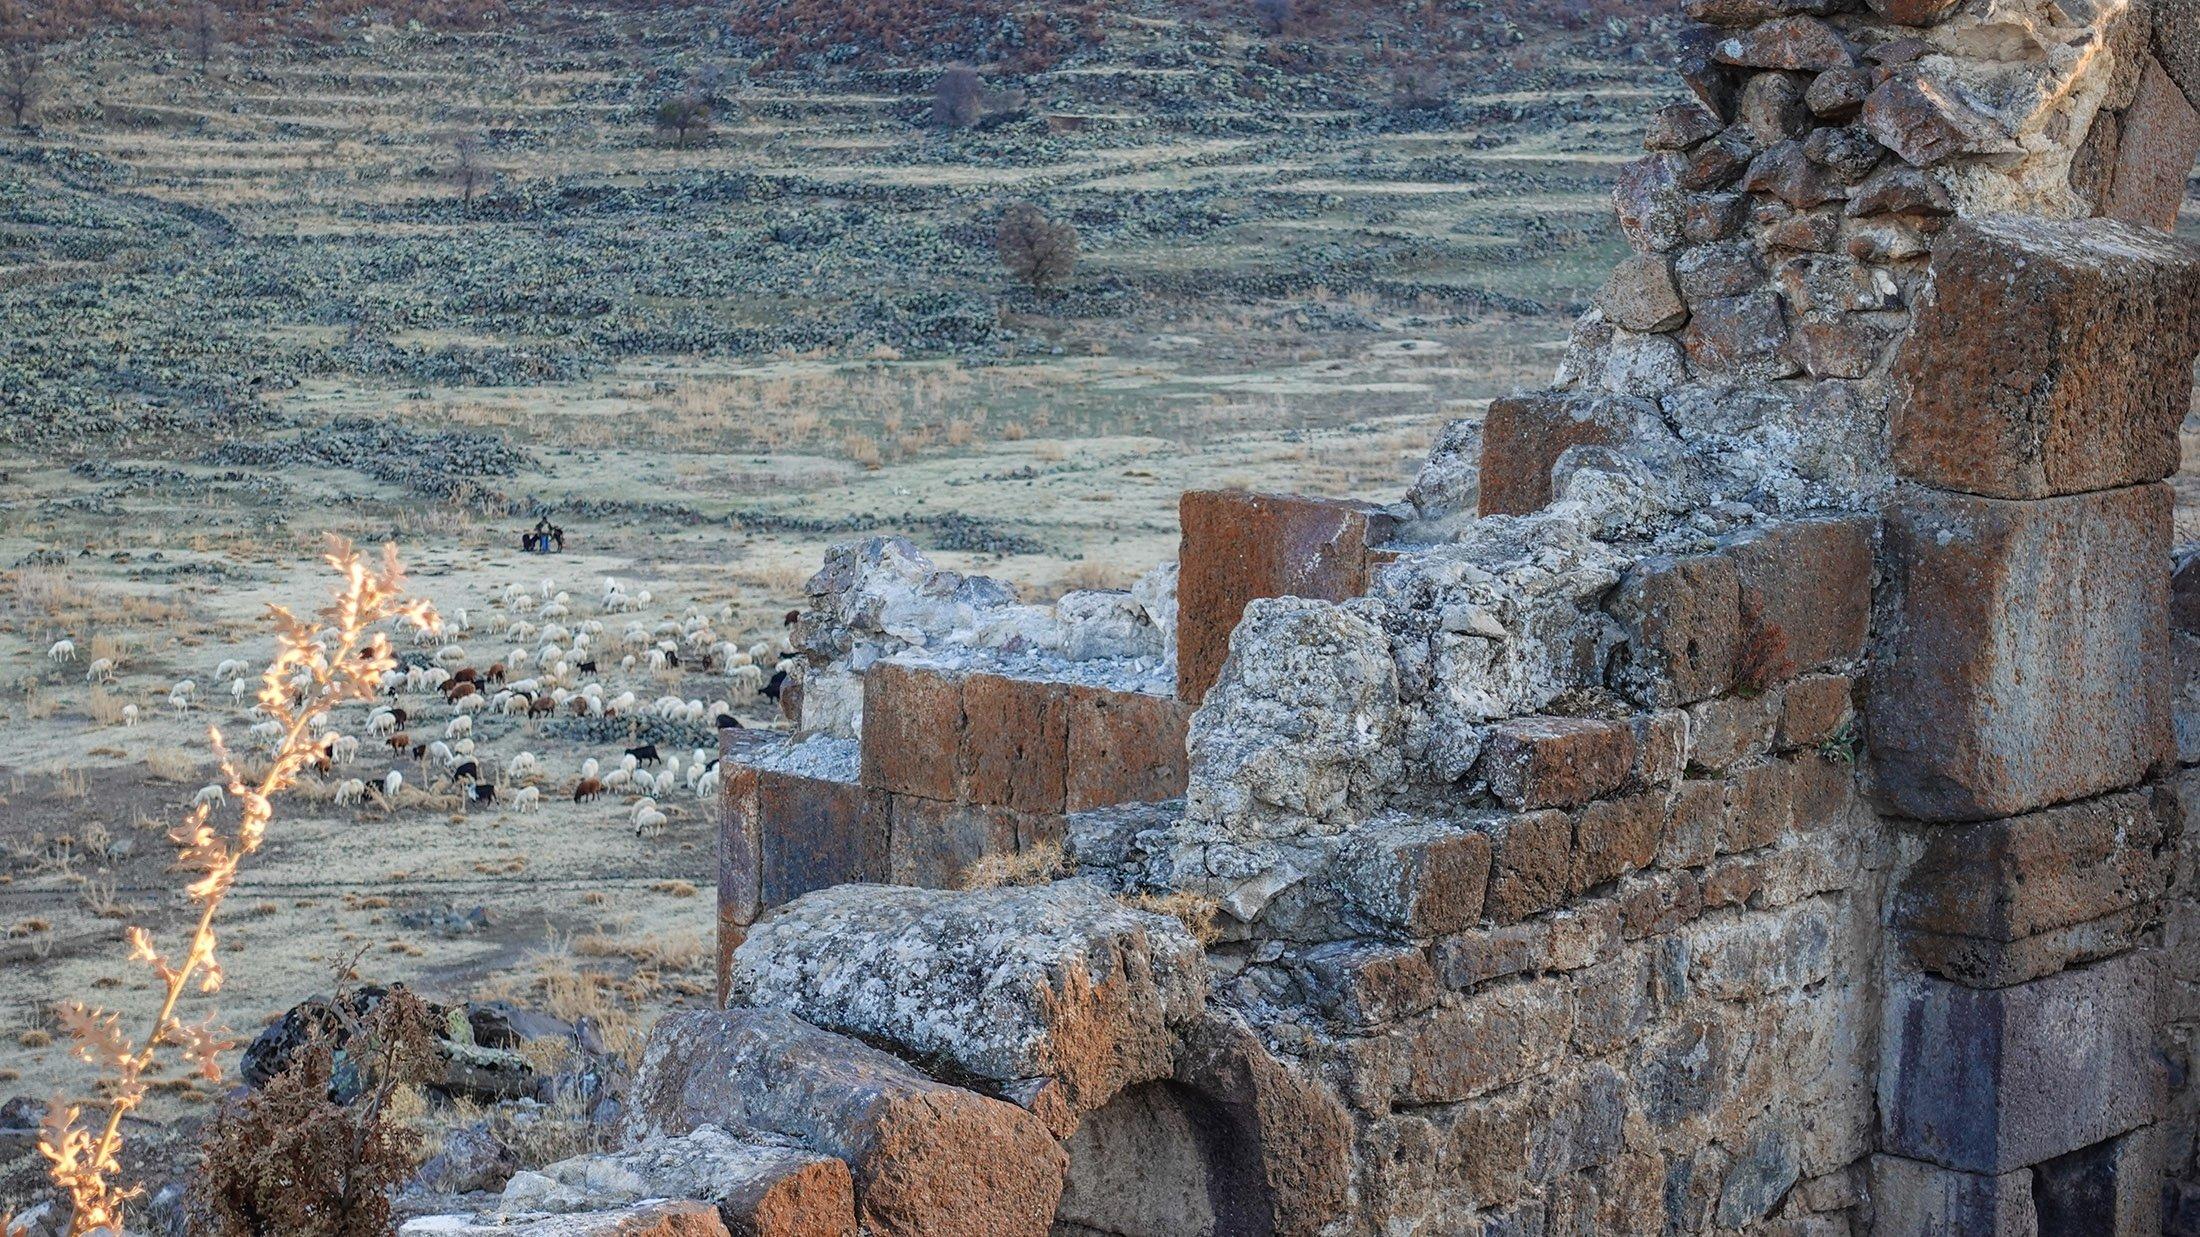 A flock of sheep behind the Vaulted Church at Mokissos. (Photo by Argun Konuk)